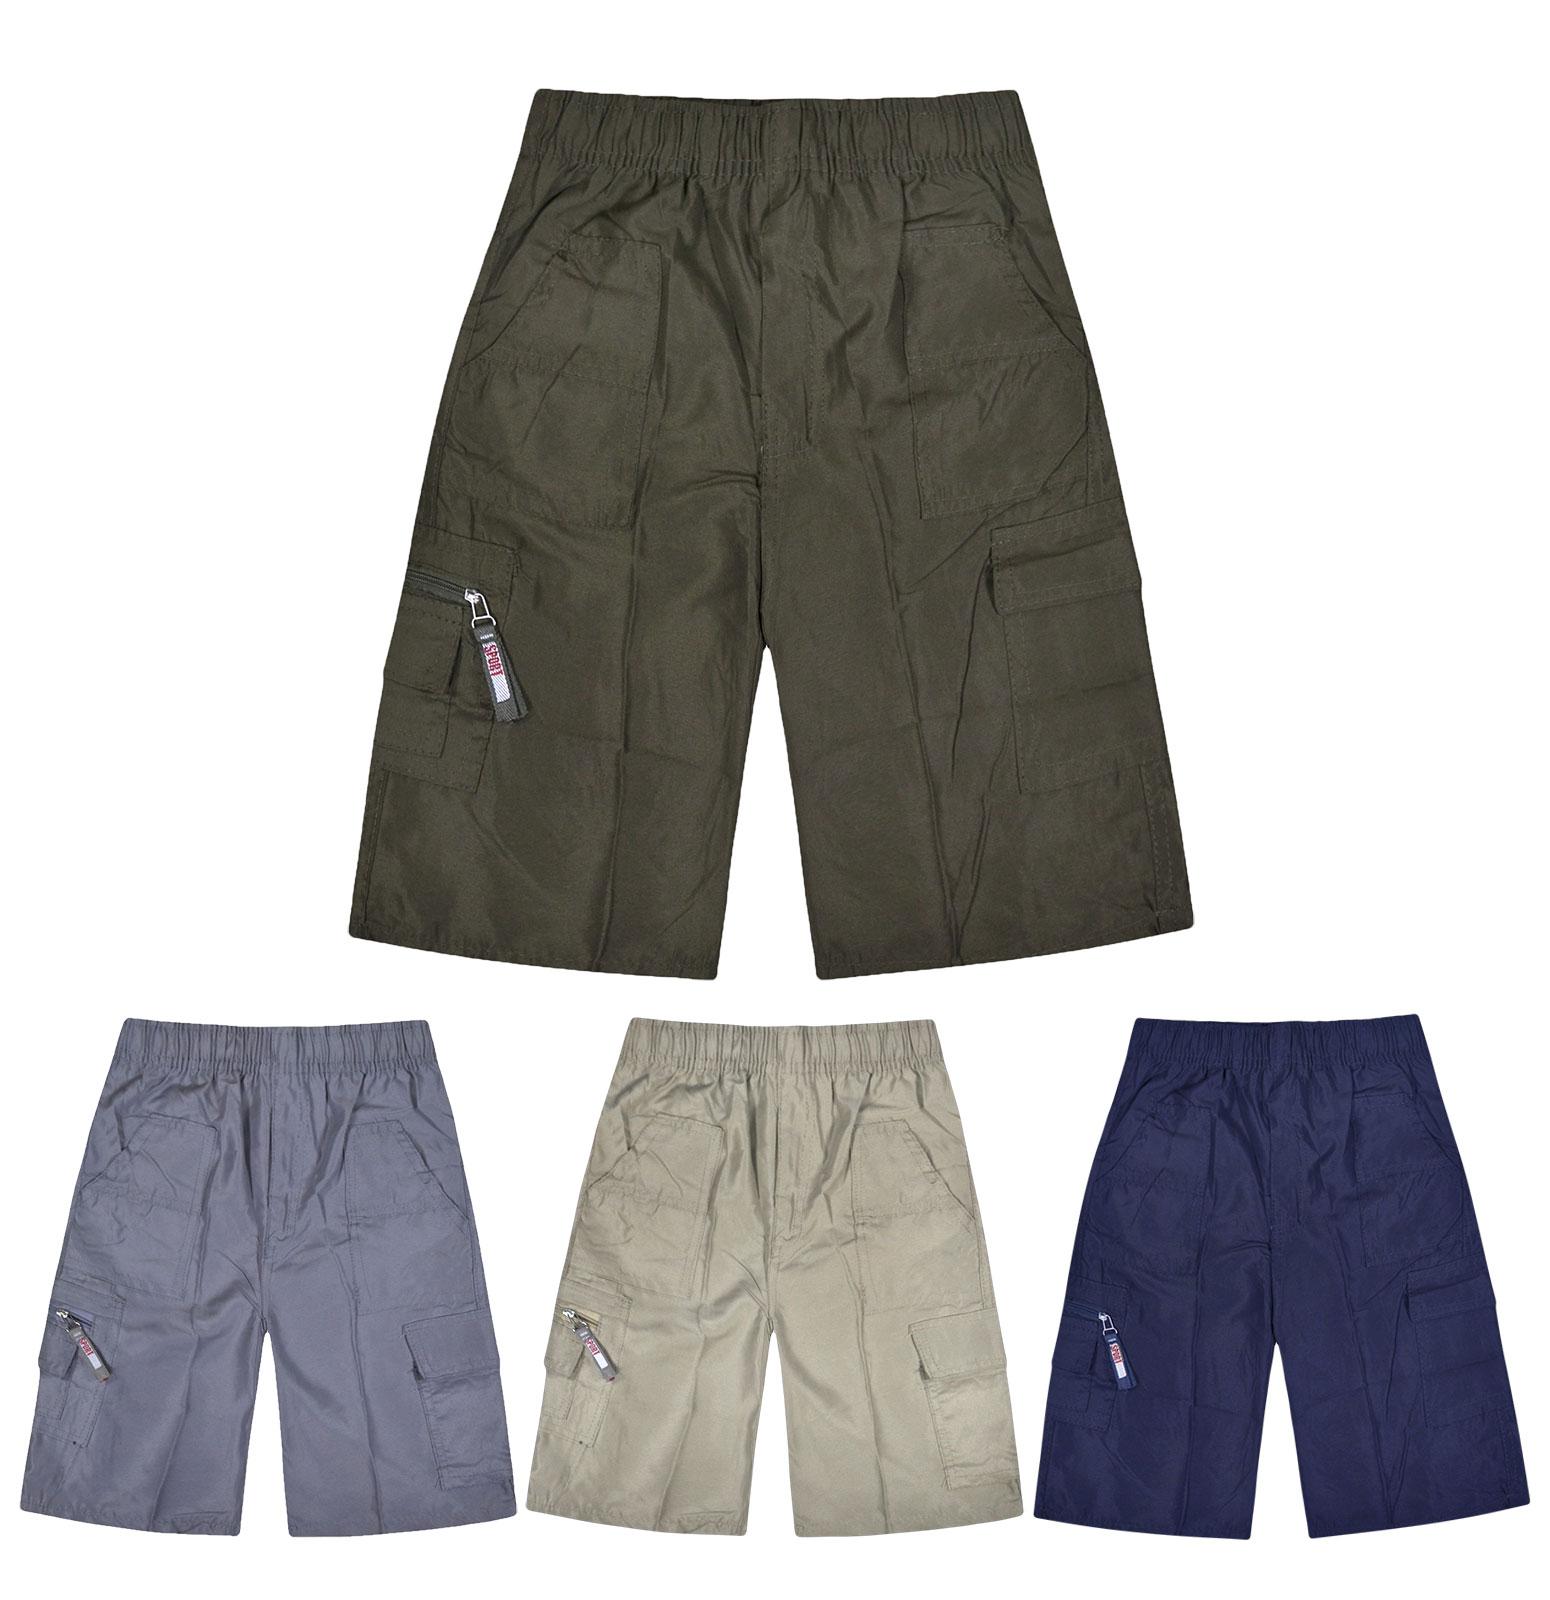 Boys Cotton Shorts Plain Coloured GOOD QUALITY Ages 3-14 Years Elastic Waist